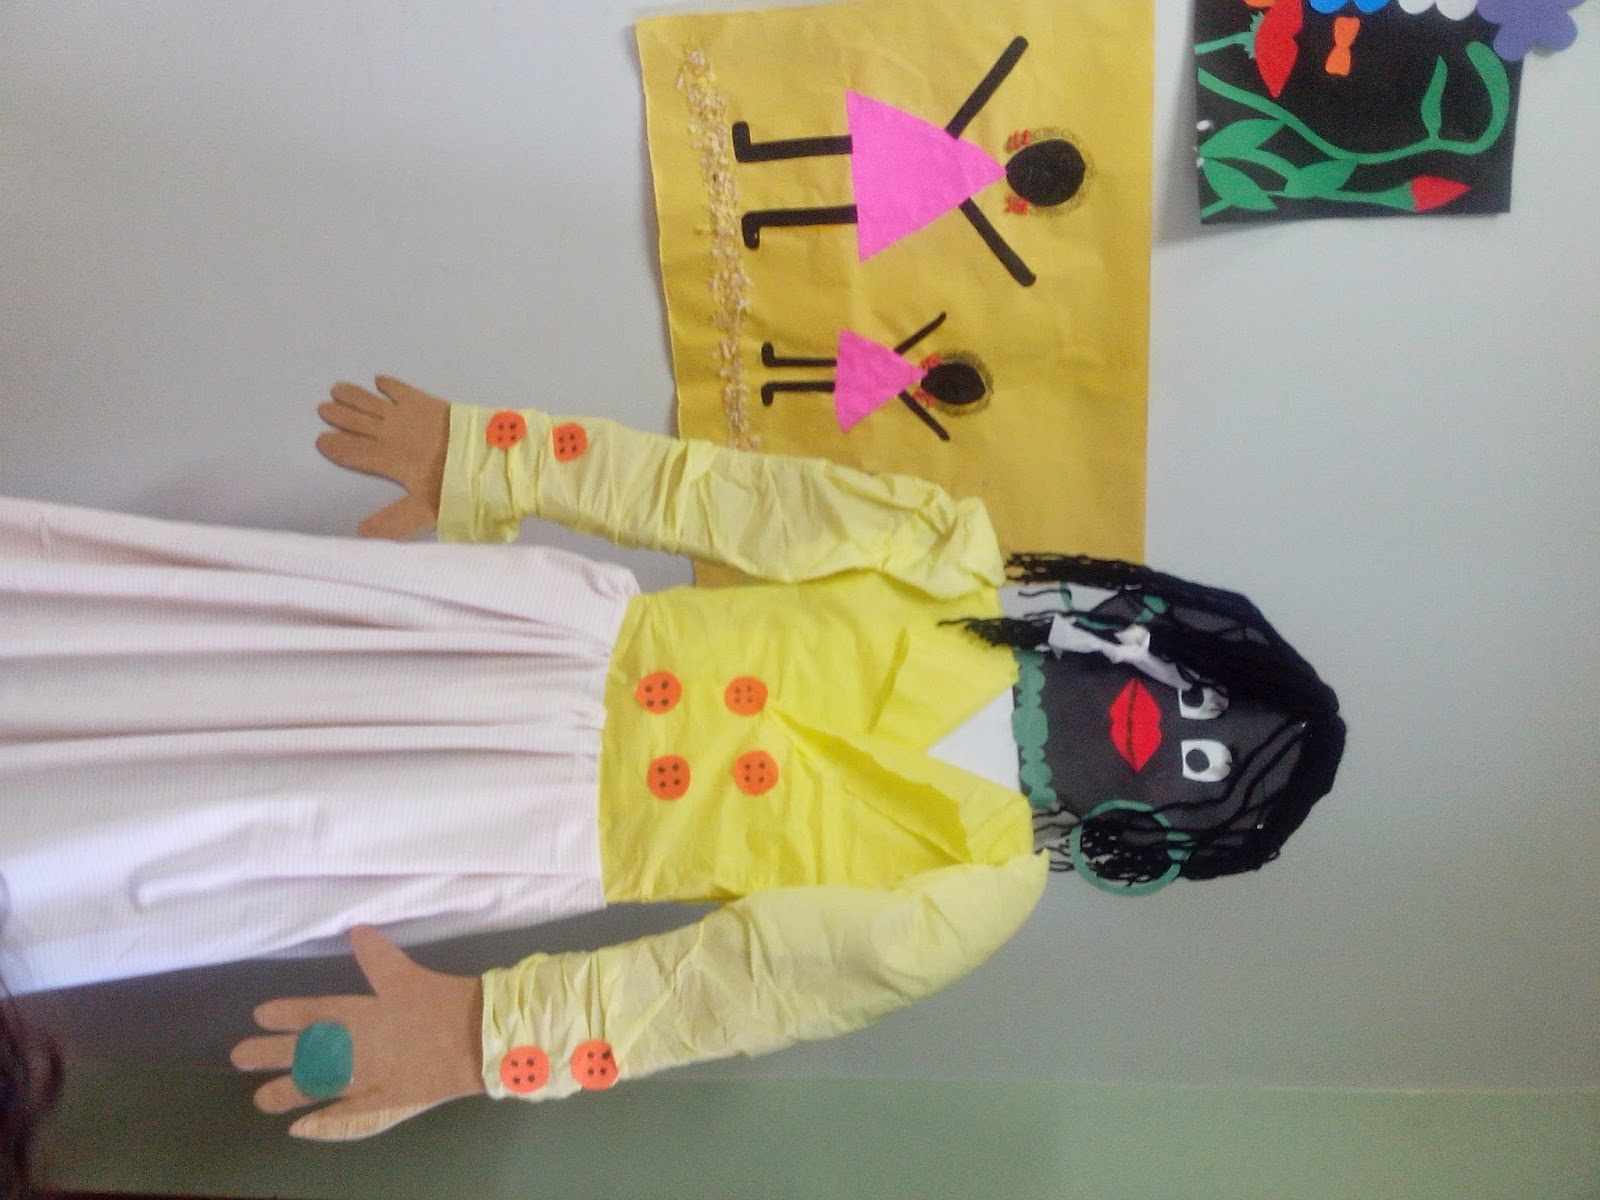 A magia do Educar: Projeto Menina Bonita do Laço de Fita